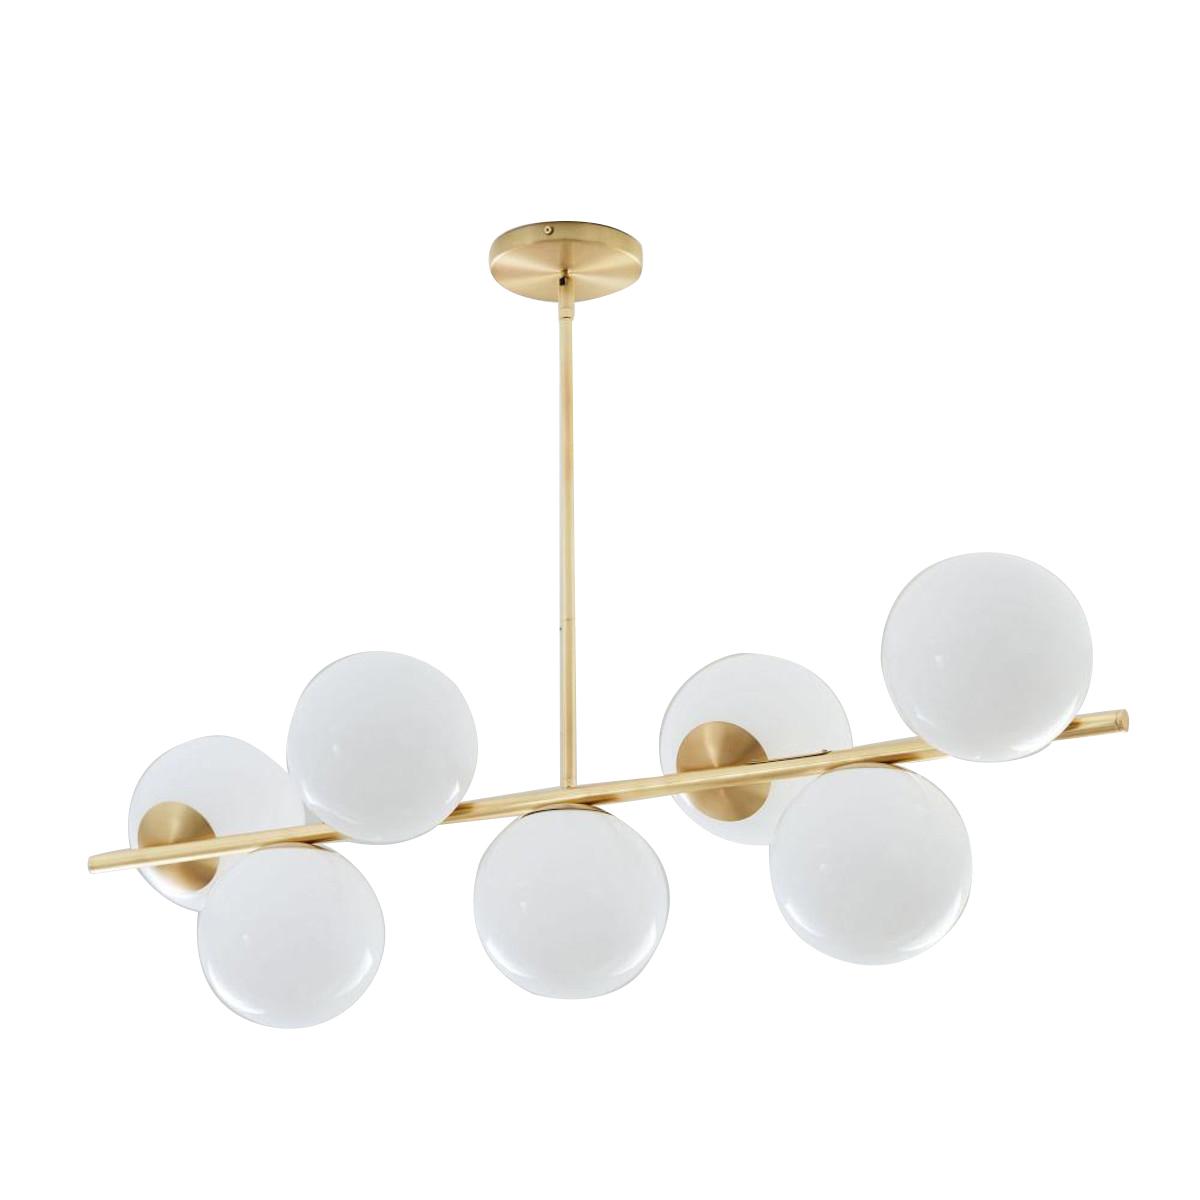 sphere-stem-7-light-chandelier-w2879-alt1_imgz-1.jpg